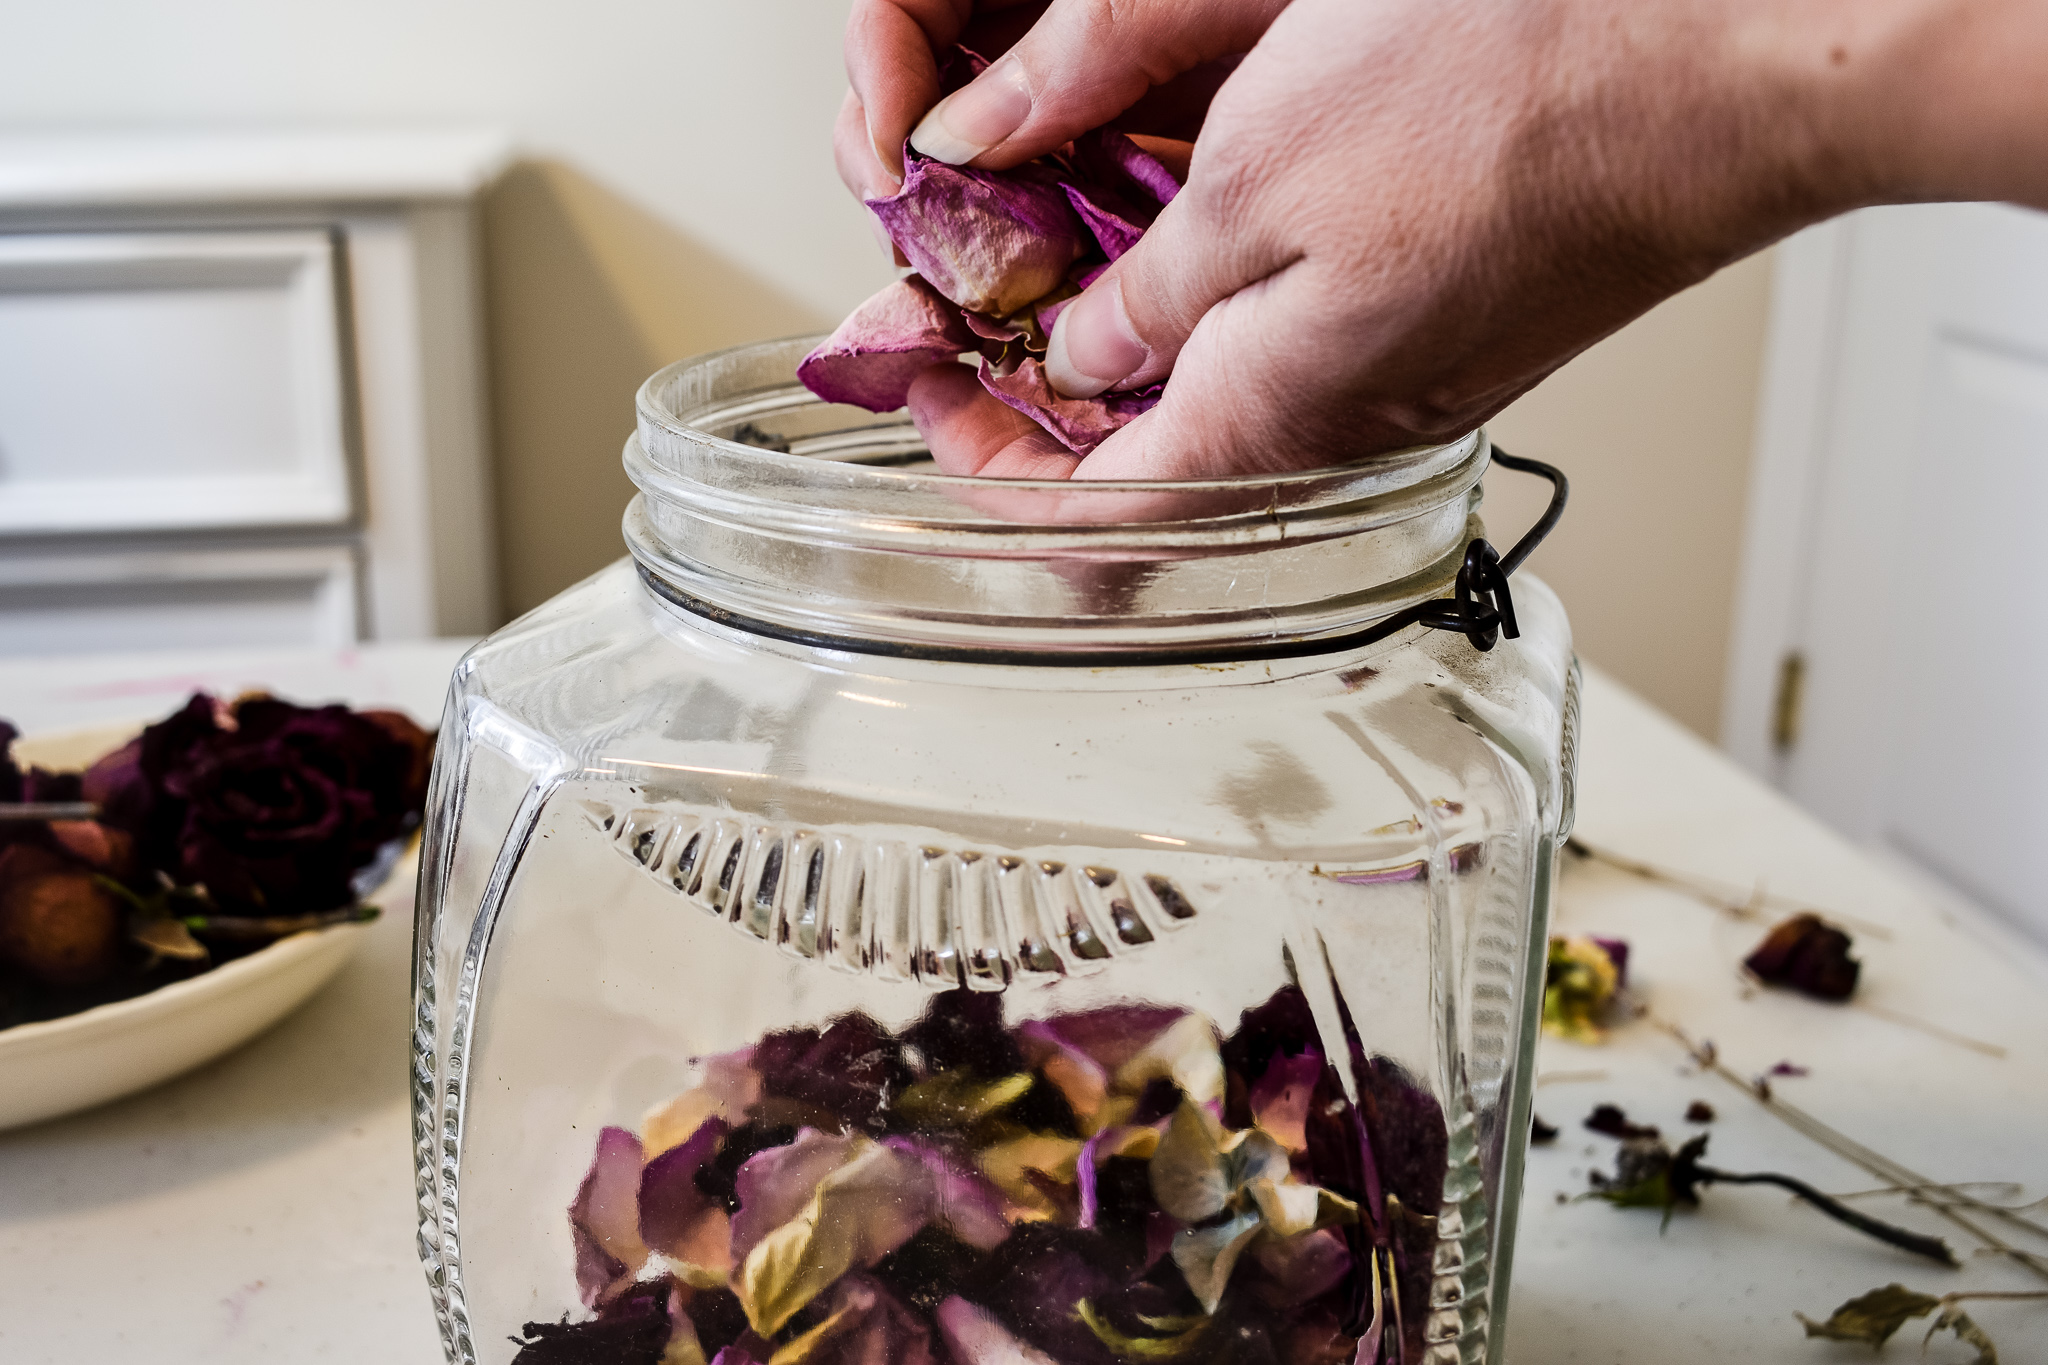 putting dried rose petals into a jar